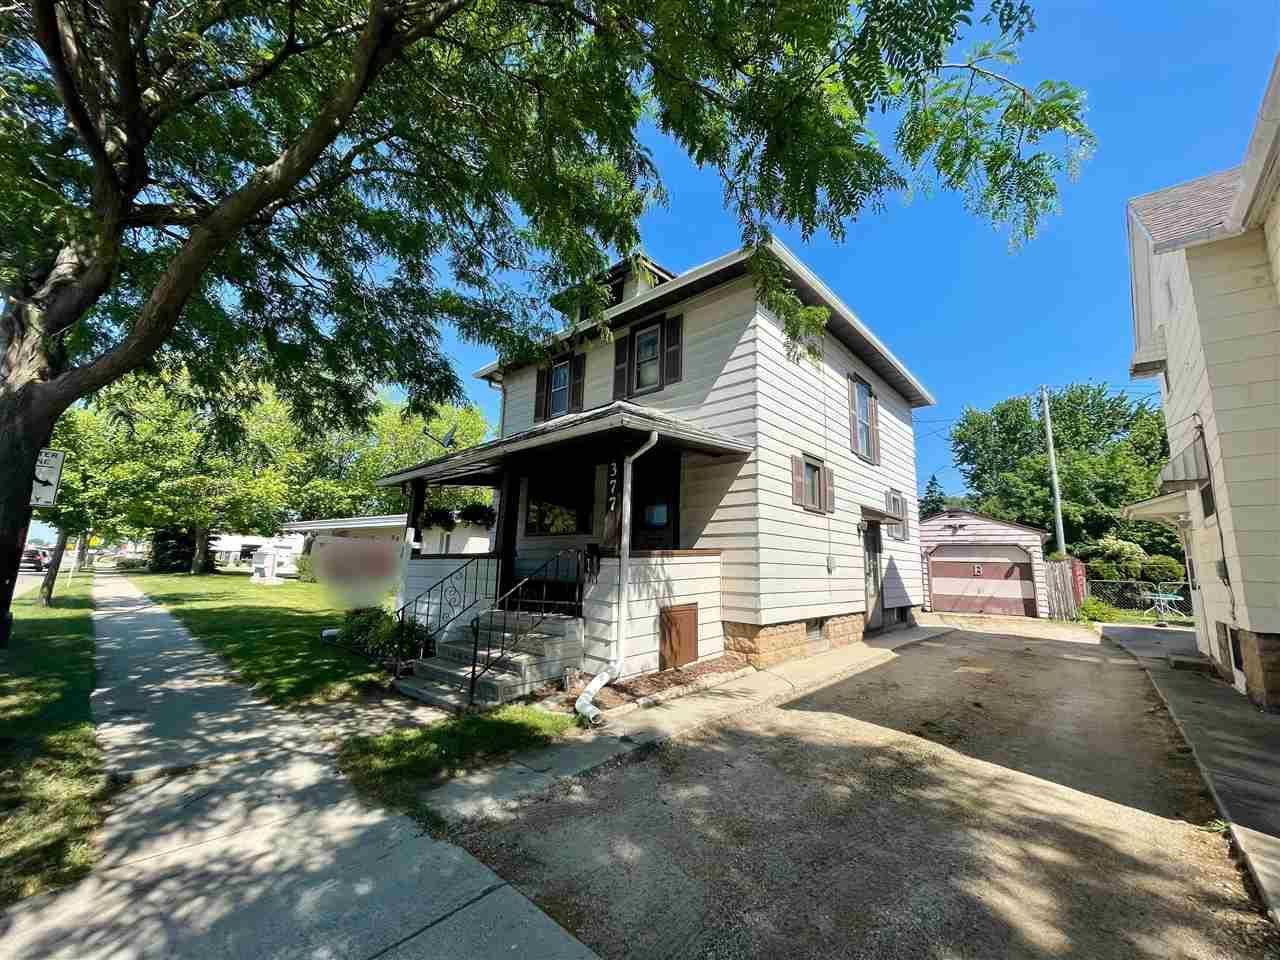 377 W JOHNSON Street, Fond du Lac, WI 54937 - MLS#: 50241872